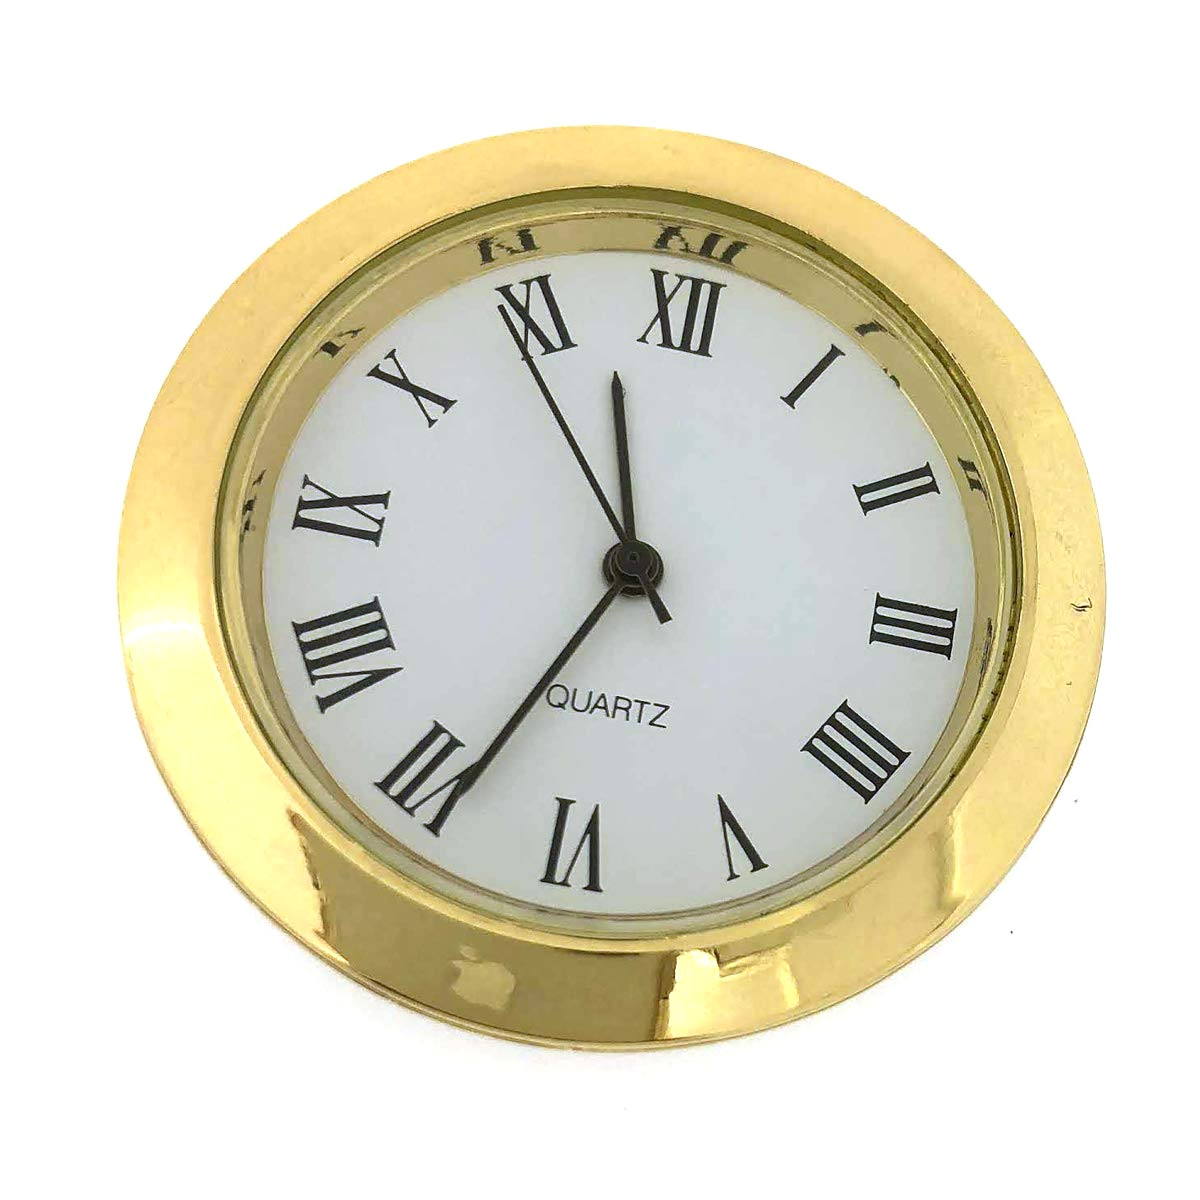 amazon com mini clock quartz movement insert round white dial gold tone bezel roman number watches